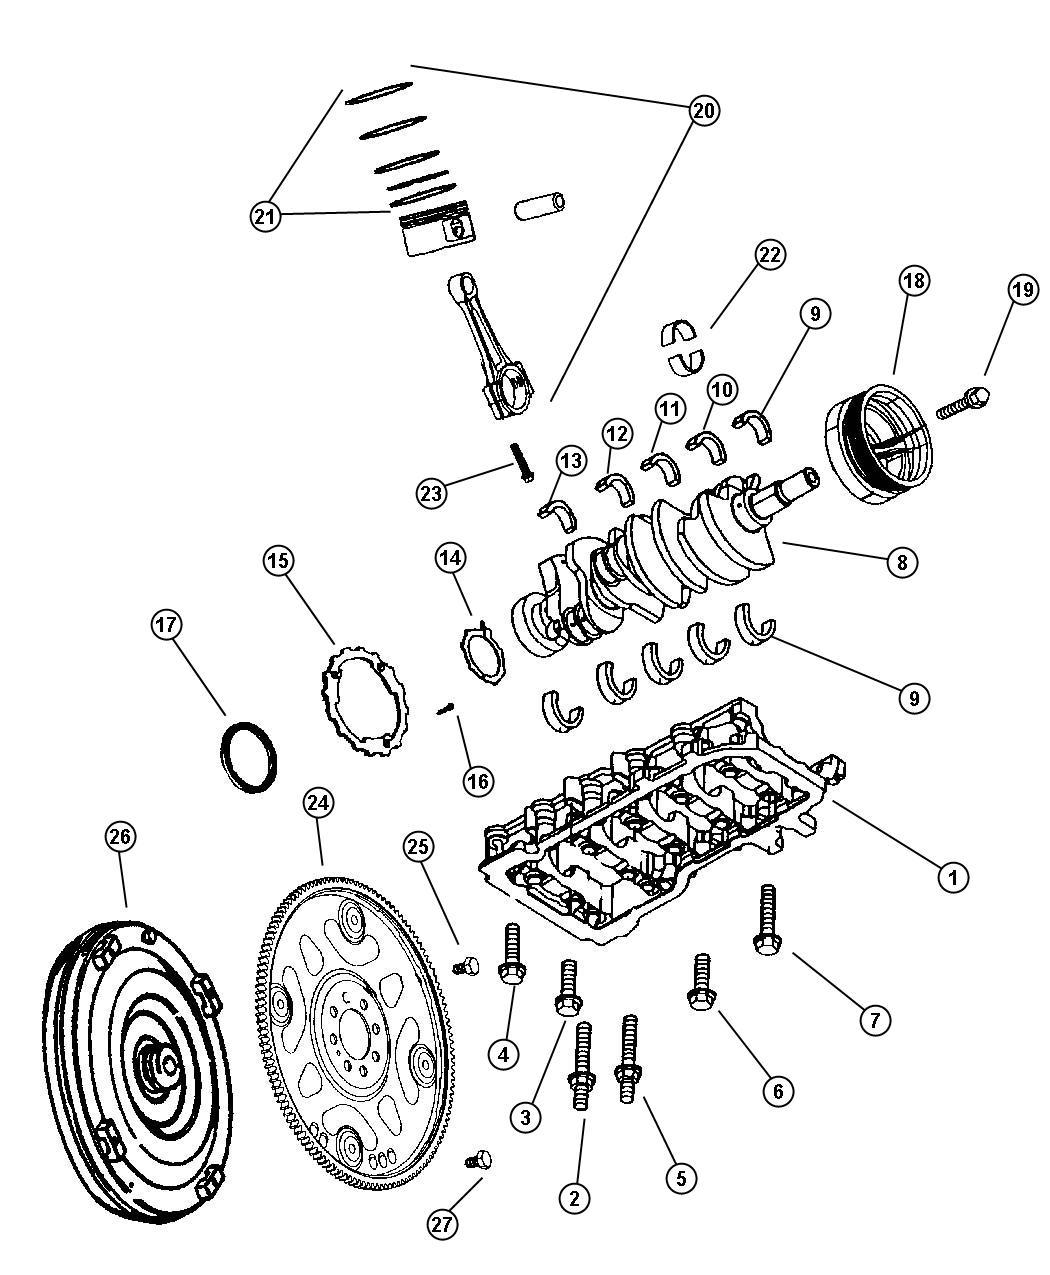 Dodge Durango Used For Piston Pin And Rod Std Engine Crankshaft Torque